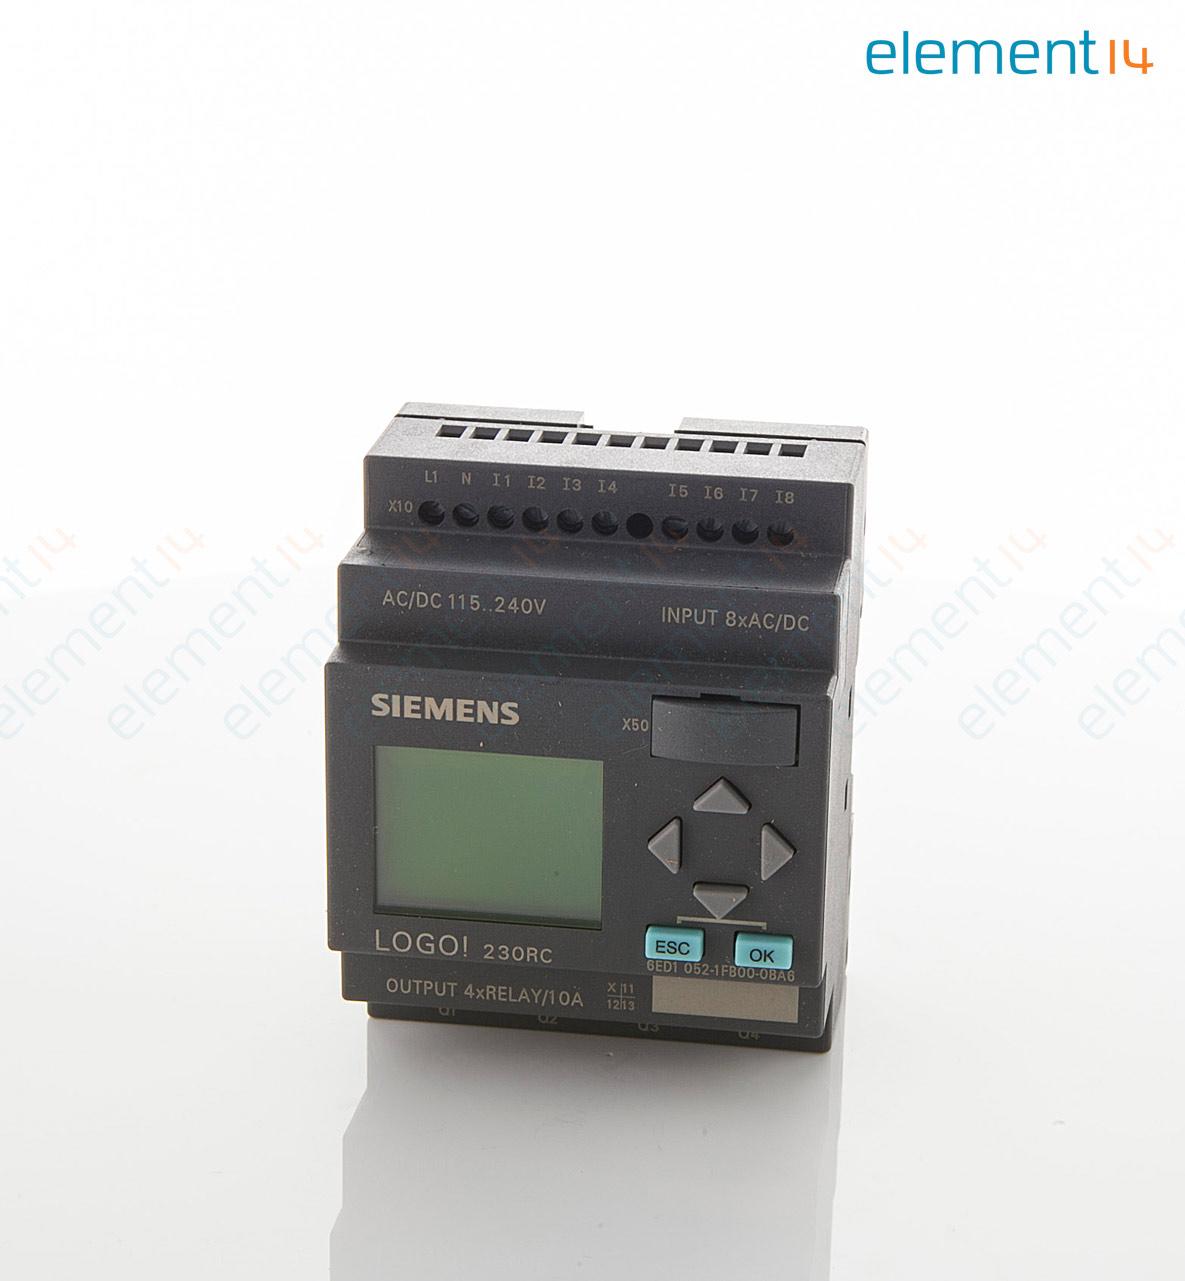 6ed1 052 1fb00 0ba6 siemens plc logo series modular